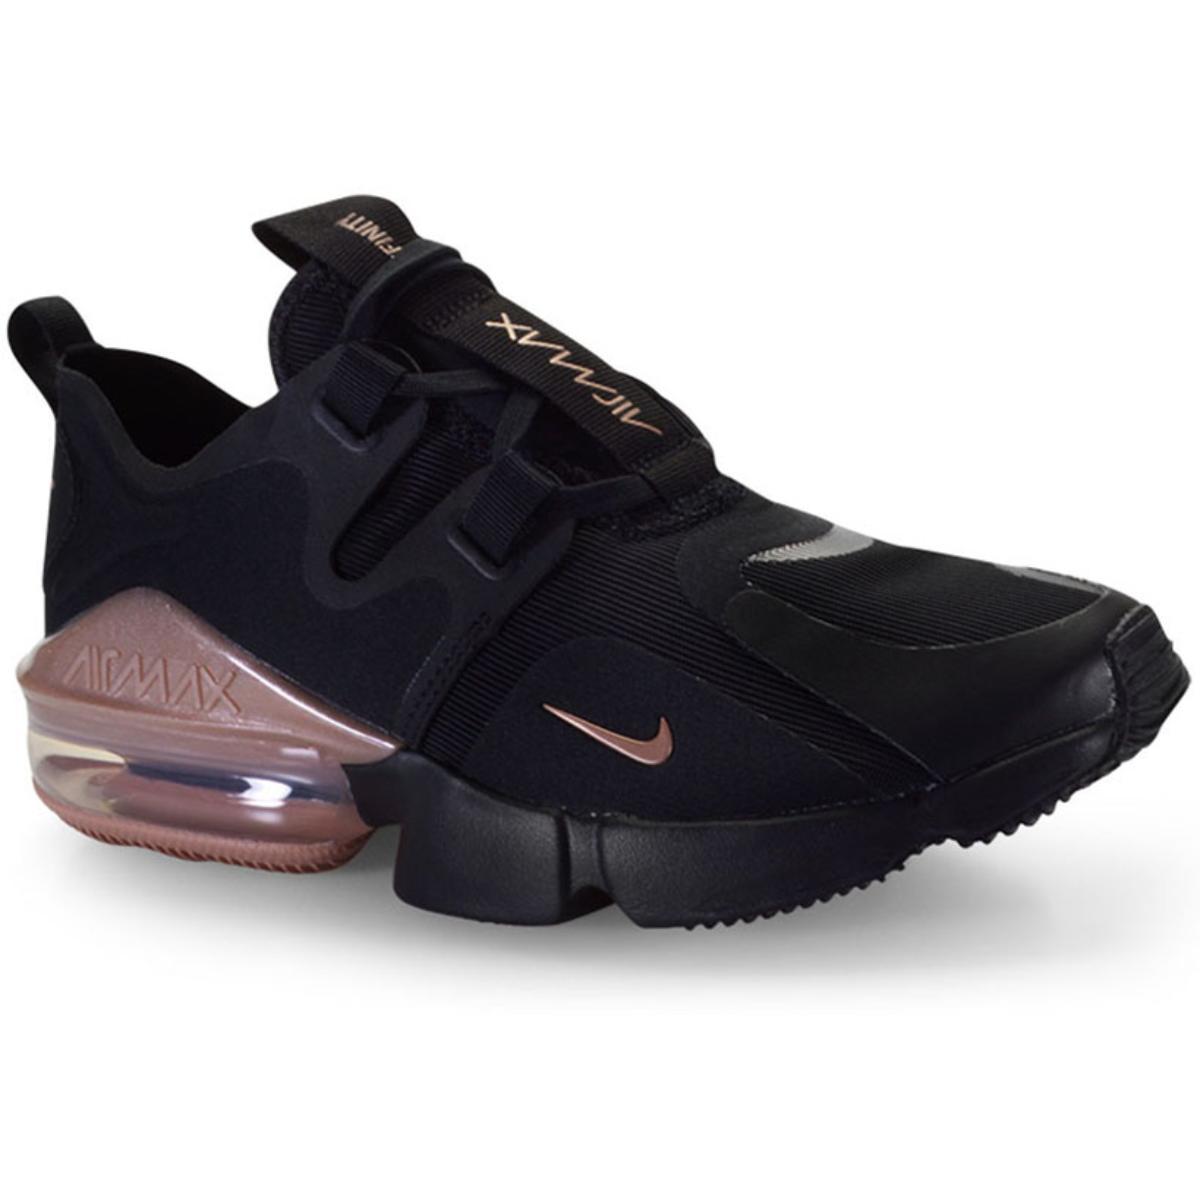 Tênis Feminino Nike Bq4284-001 Wmns Air Max Infinity Preto/bronze